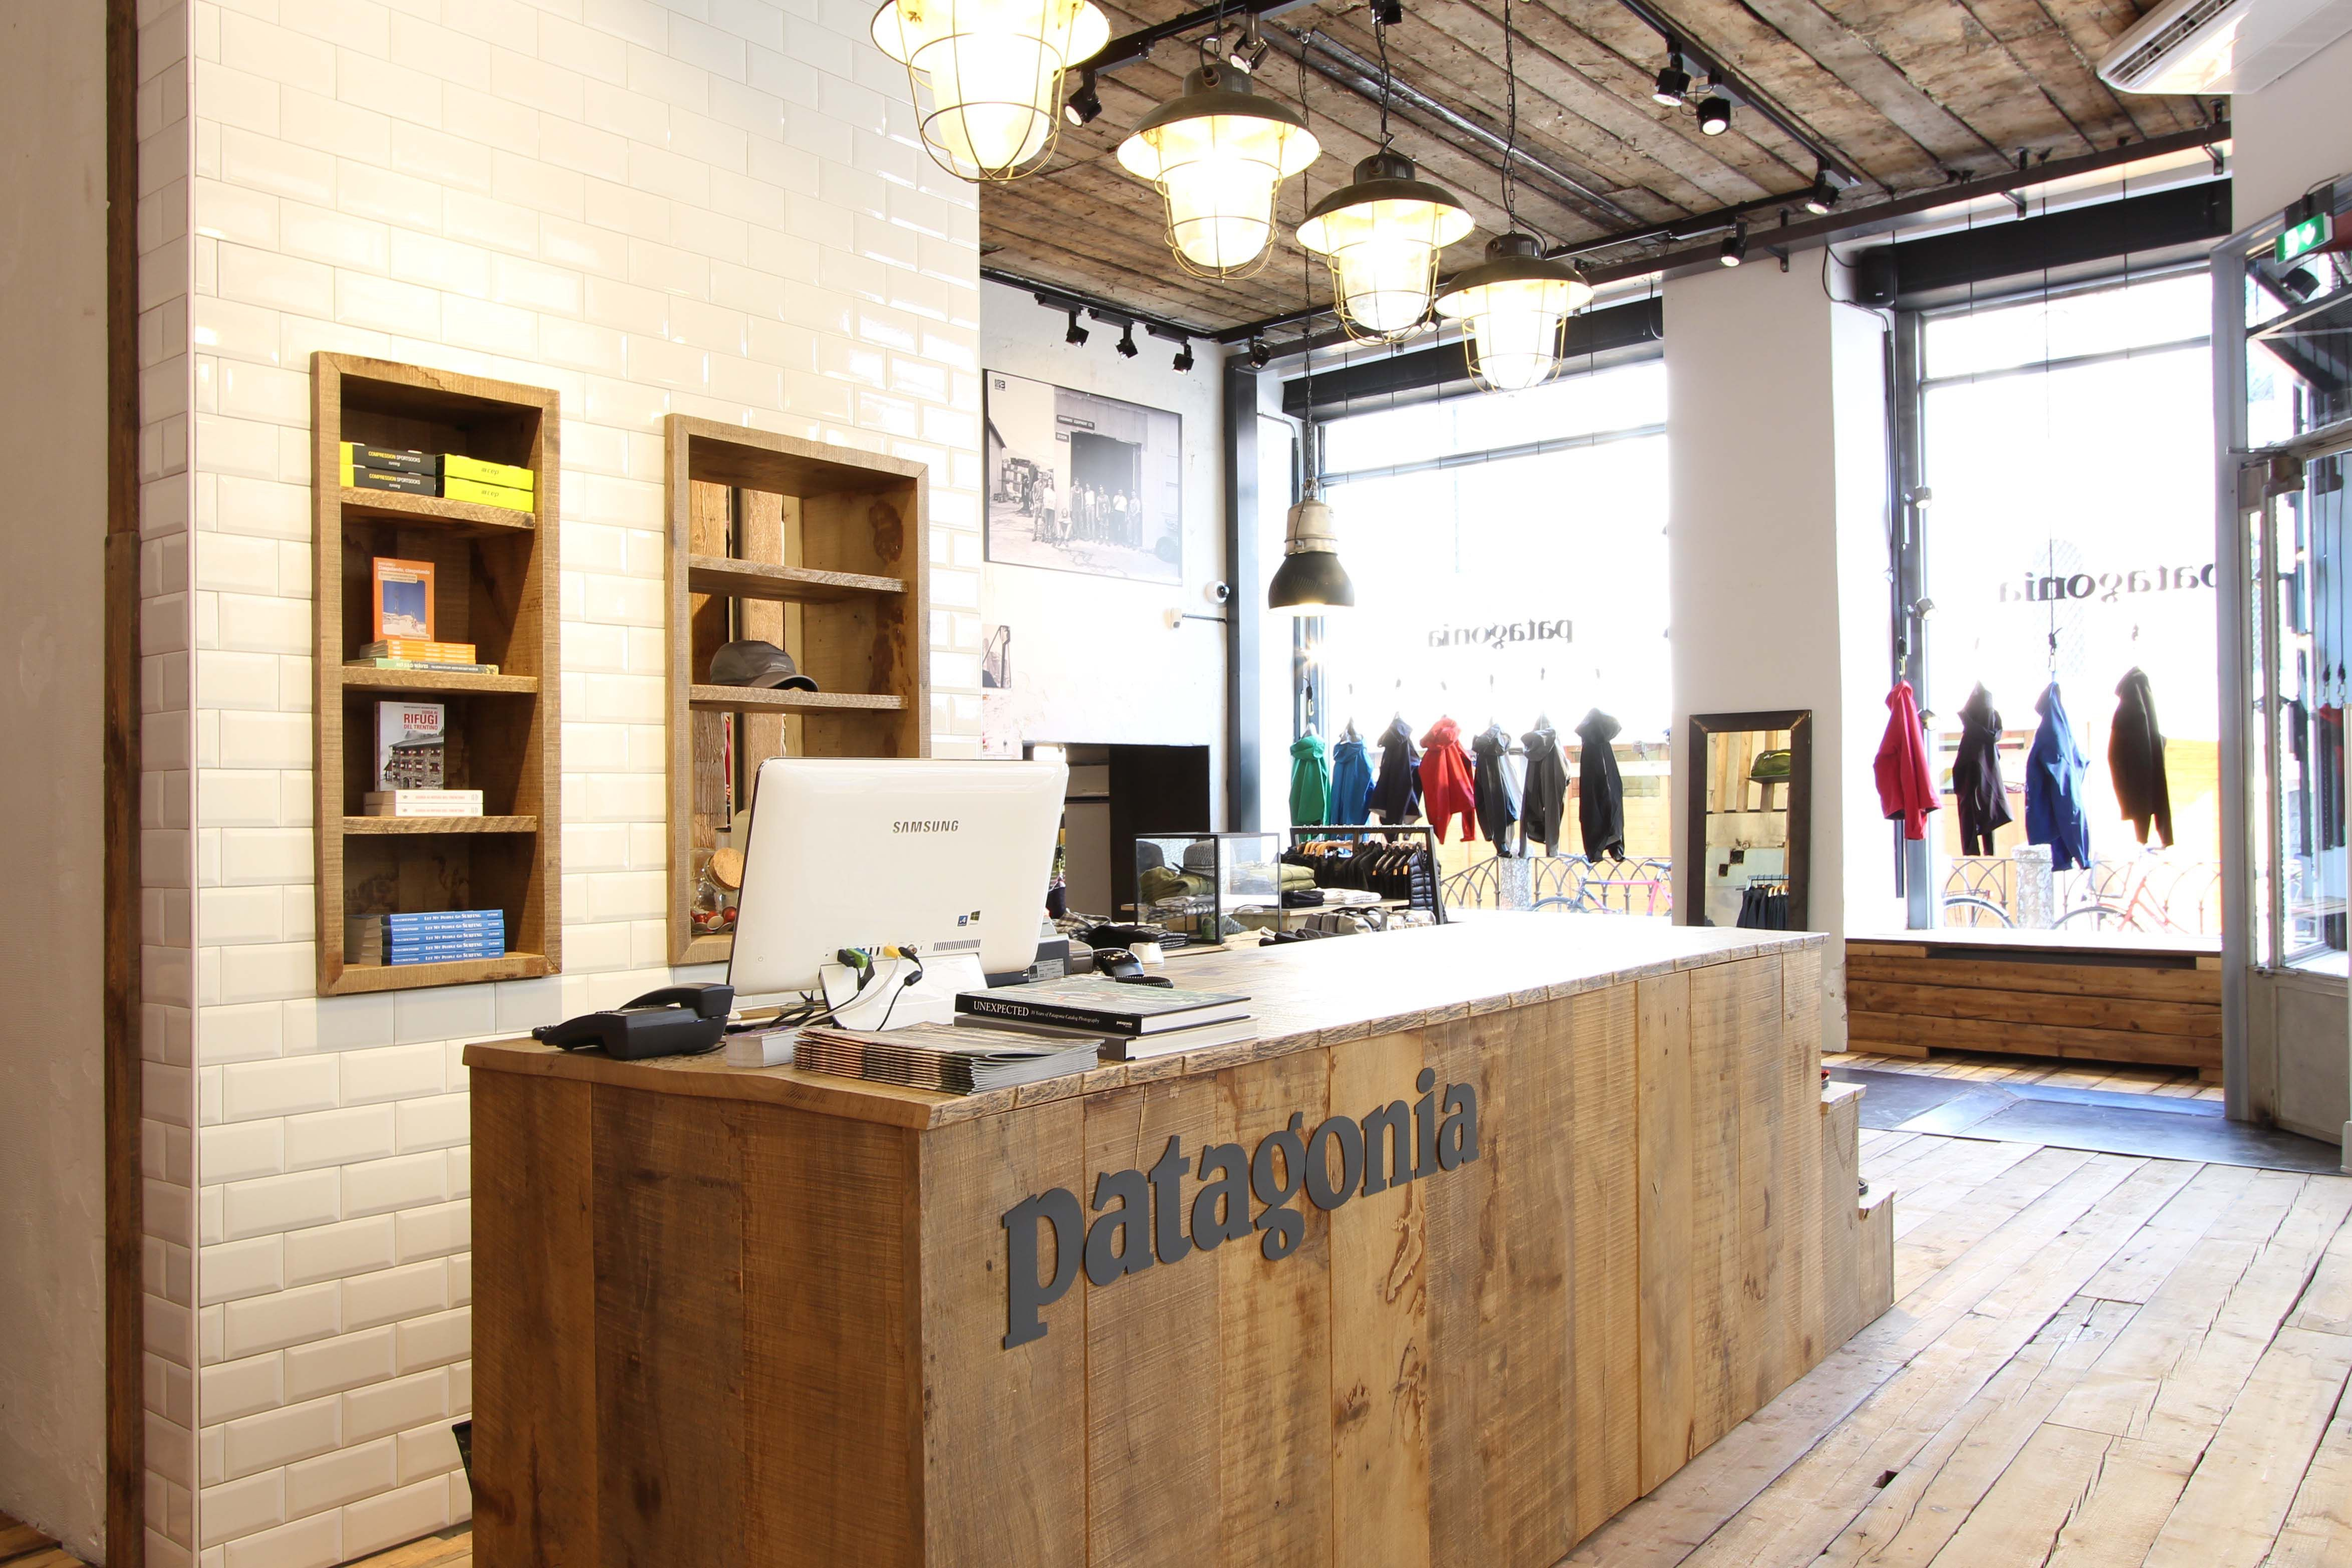 100 Home Design Stores Vancouver Home Design Store Home Design Ideas Fencing Vancouver